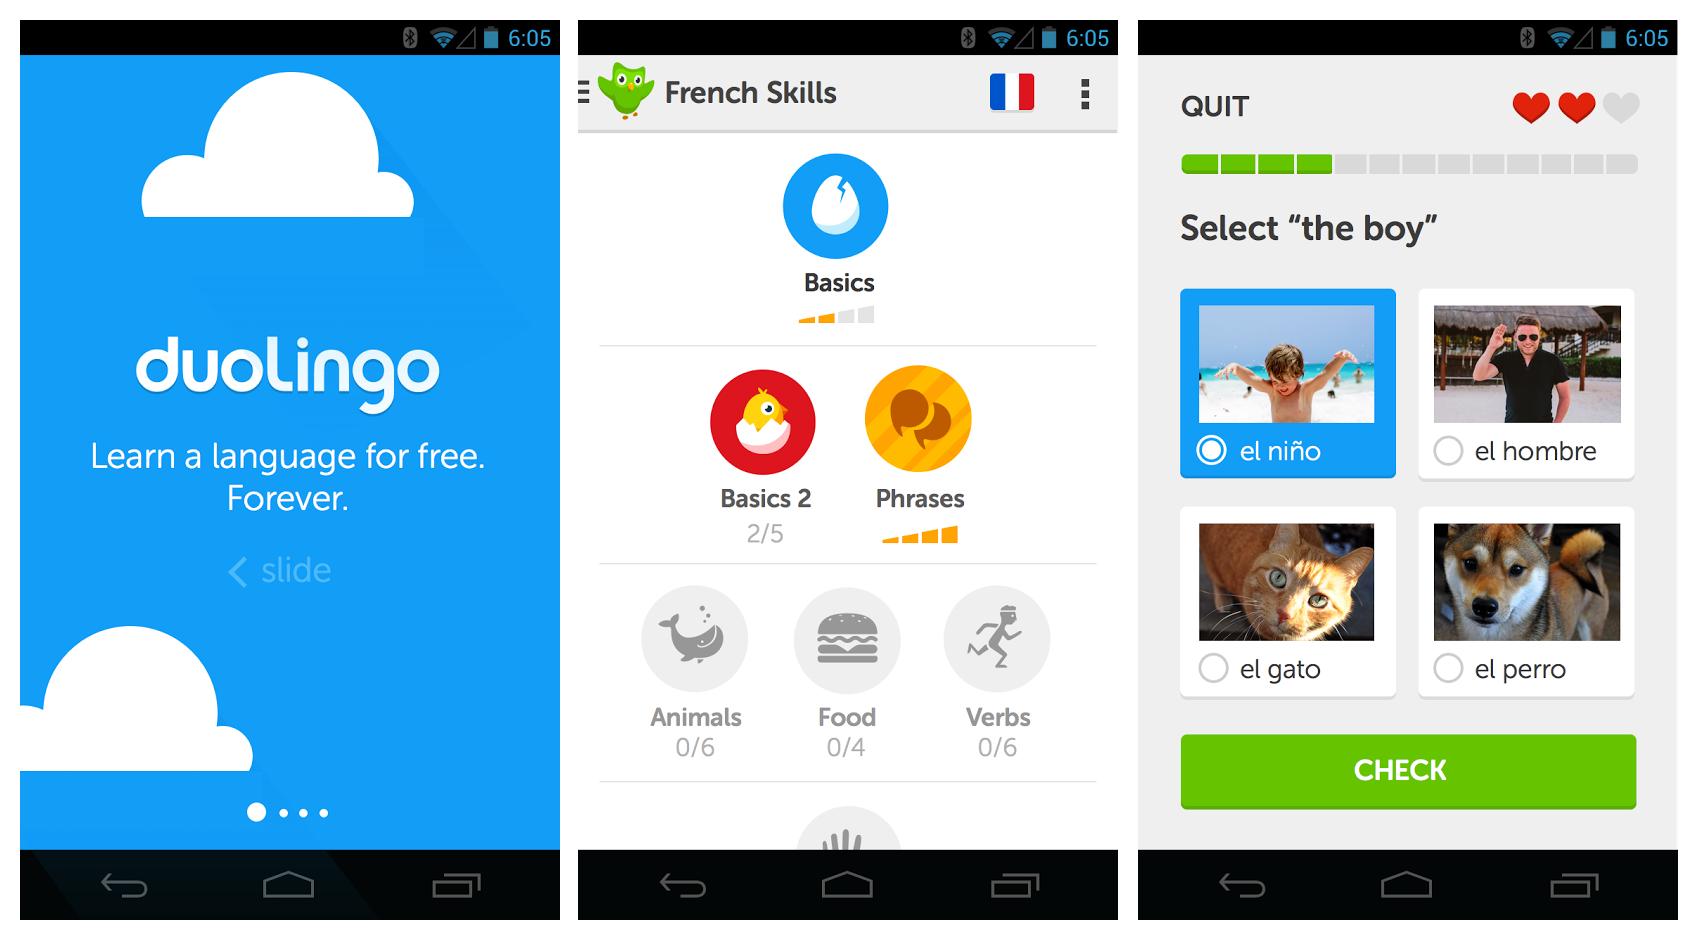 Duolingo-app Best Language Learning Apps of 2021